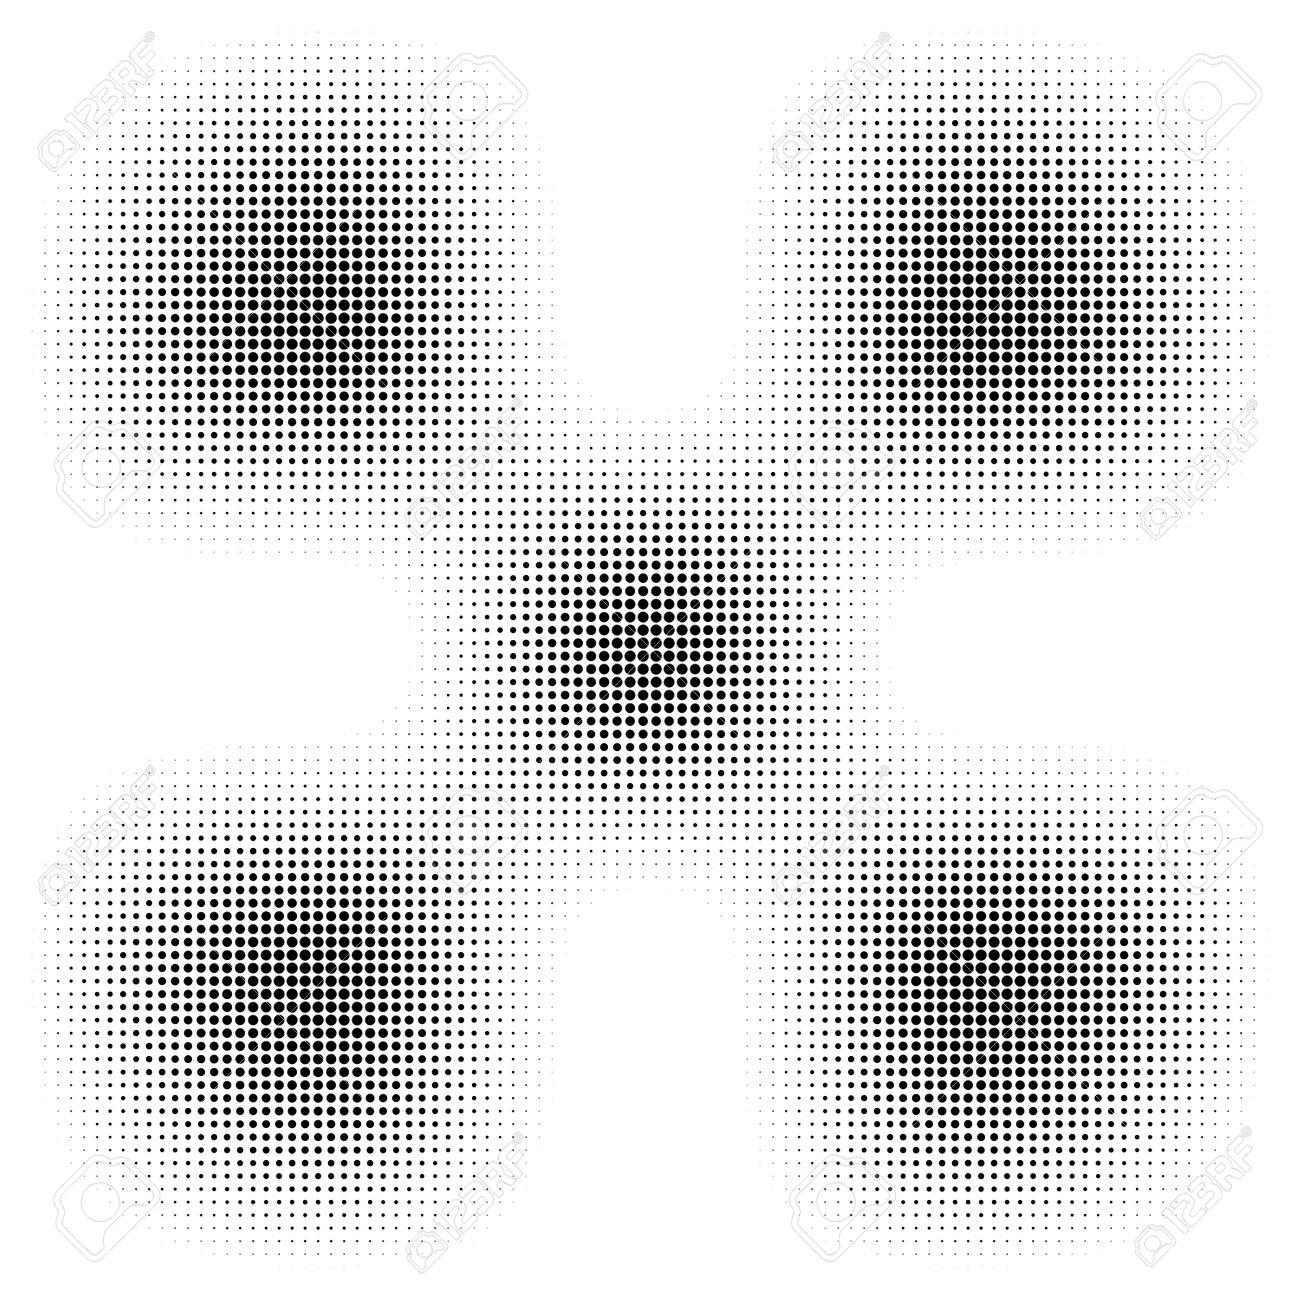 Circle halftone, screentone vector illustrations. Dots, dotted, speckles vector illustration - 167852428